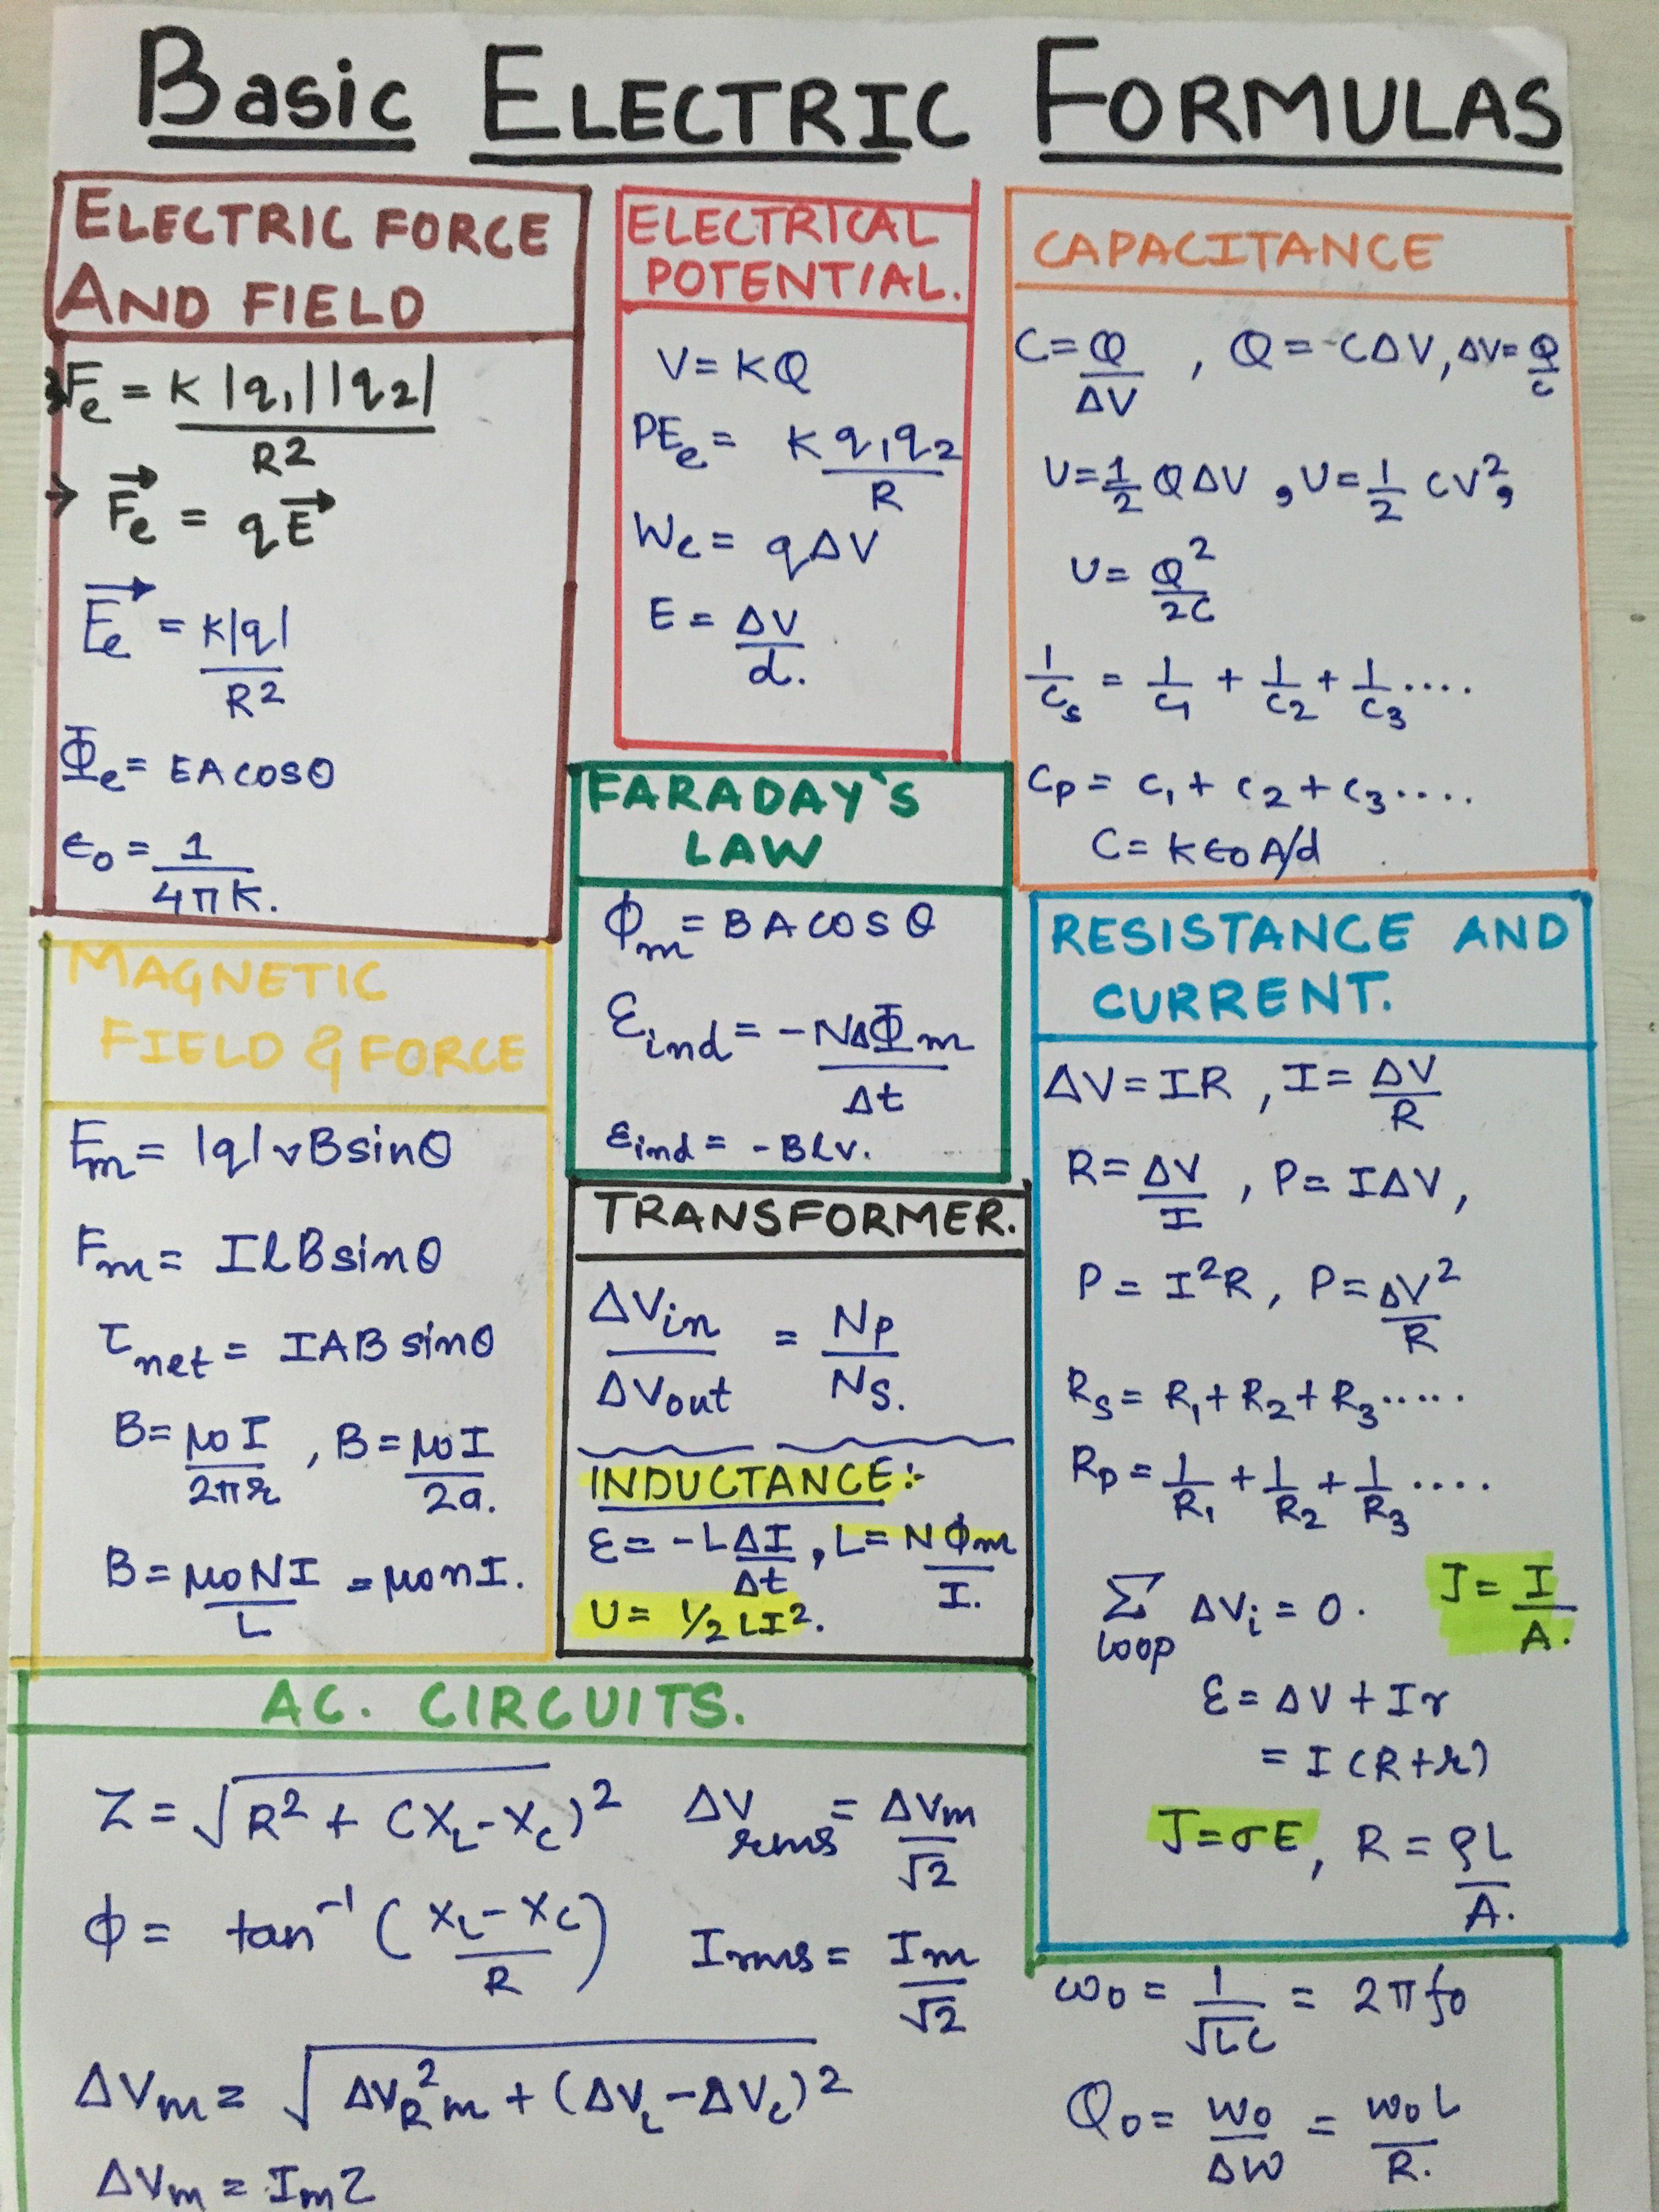 12th Electrics Formulas Forrmulas Diy Diy Creativity Transformer Electric Potential Farday S L Physics Formulas Electricity Physics Engineering Notes [ 4032 x 3024 Pixel ]